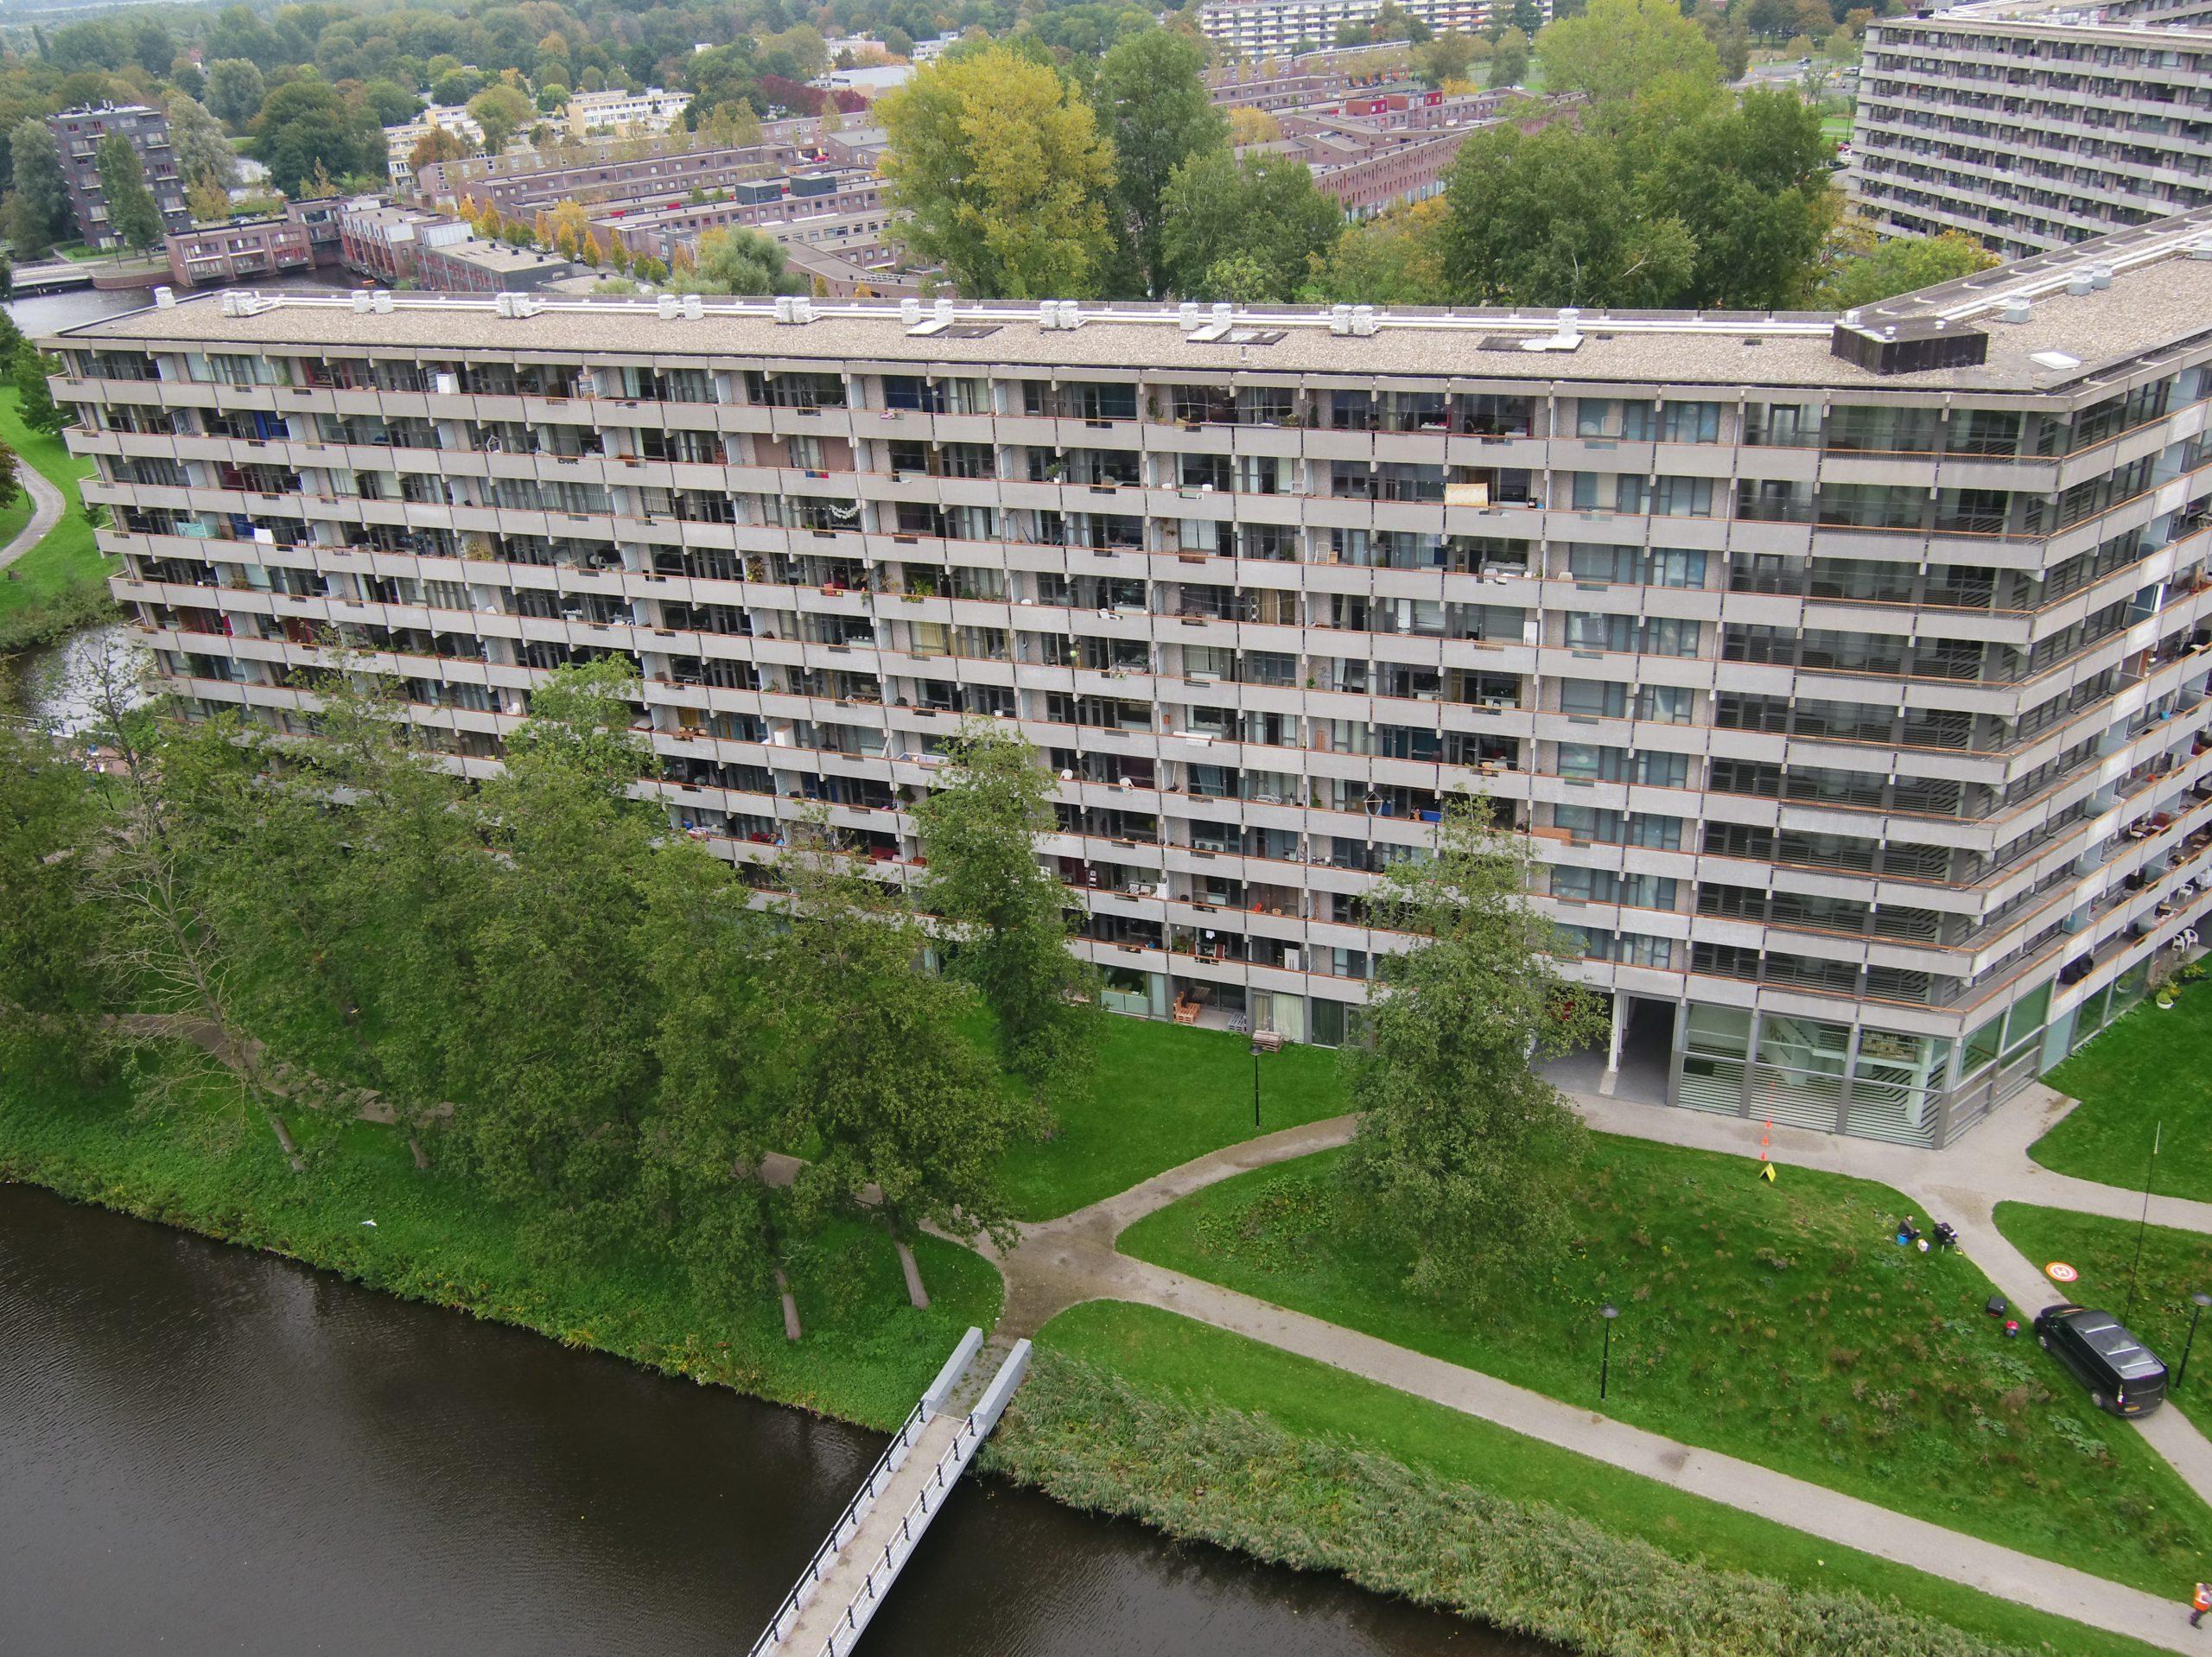 Drone foto Bijlmer